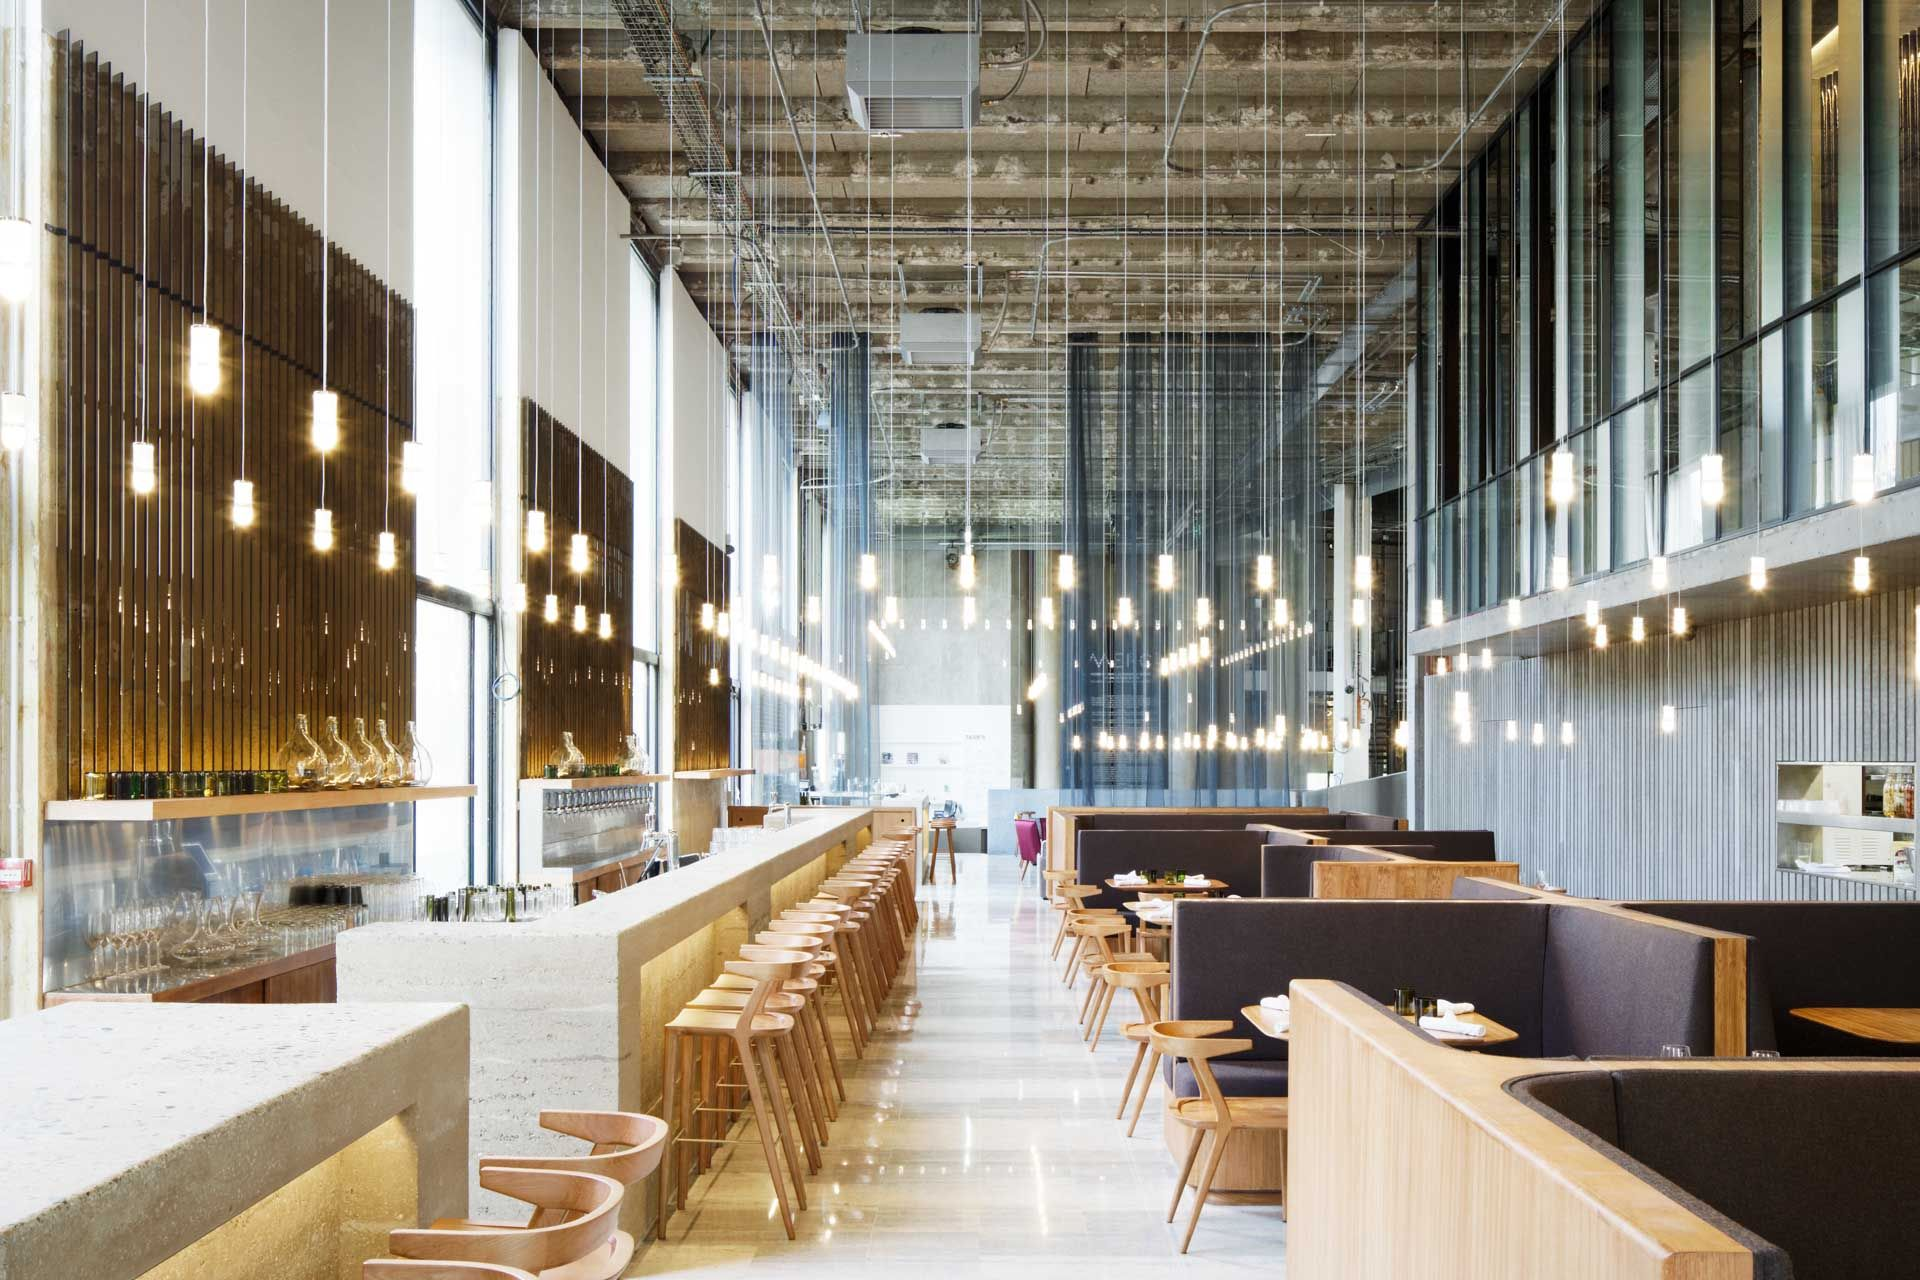 Pin By On Restaurant Pinterest Restaurants And Cafes # Muebles Janine Bogota